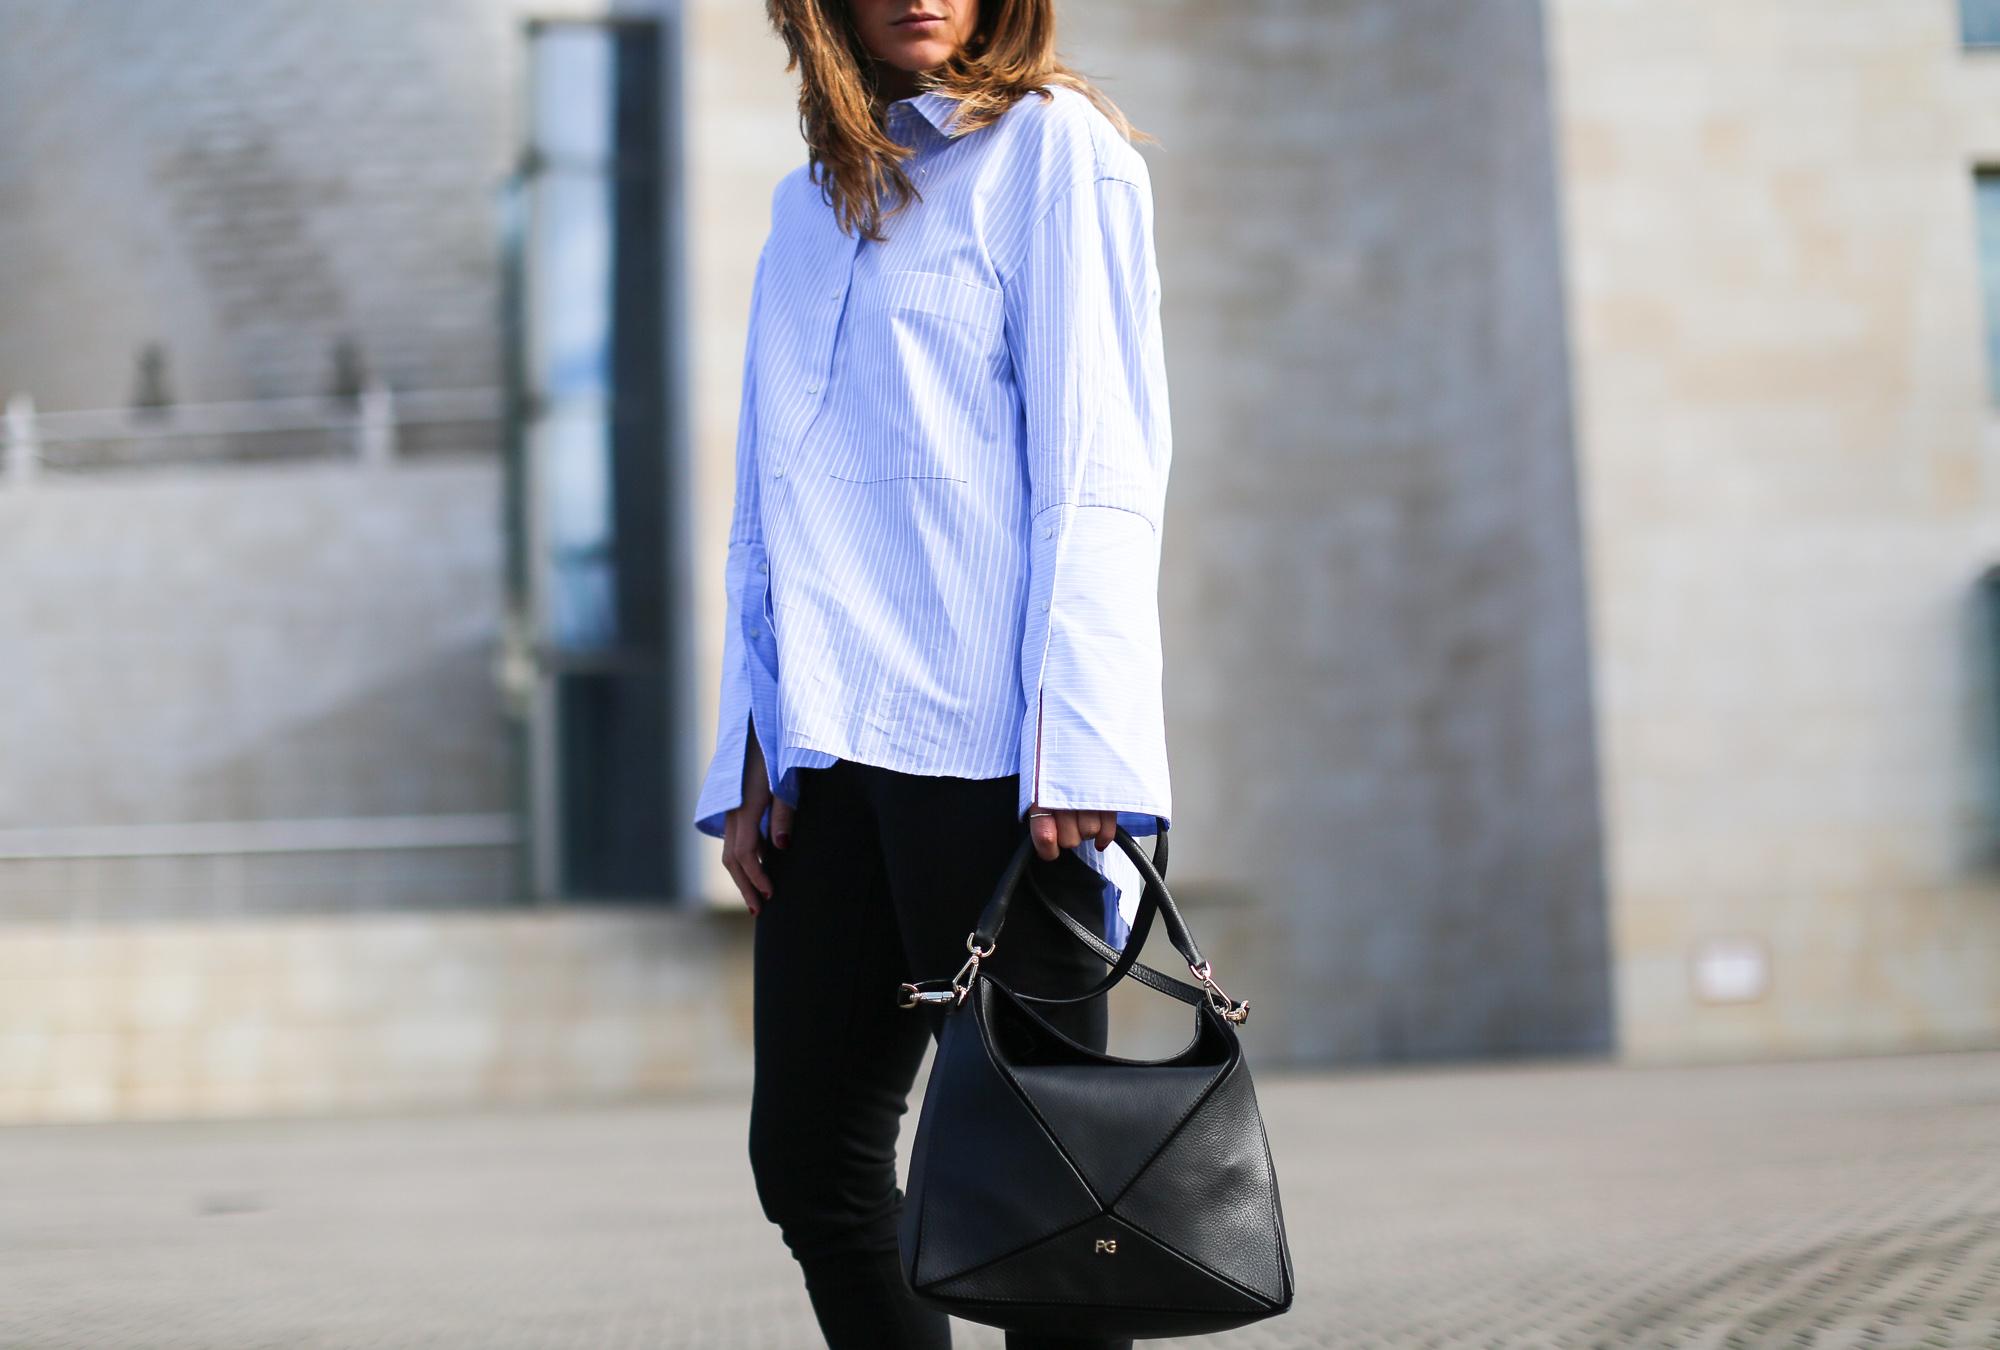 Clochet_streetstyle_fashionblogger_andotherstoriesbeigelongwoolcoat_&otherstoriessuedeankleboots-10